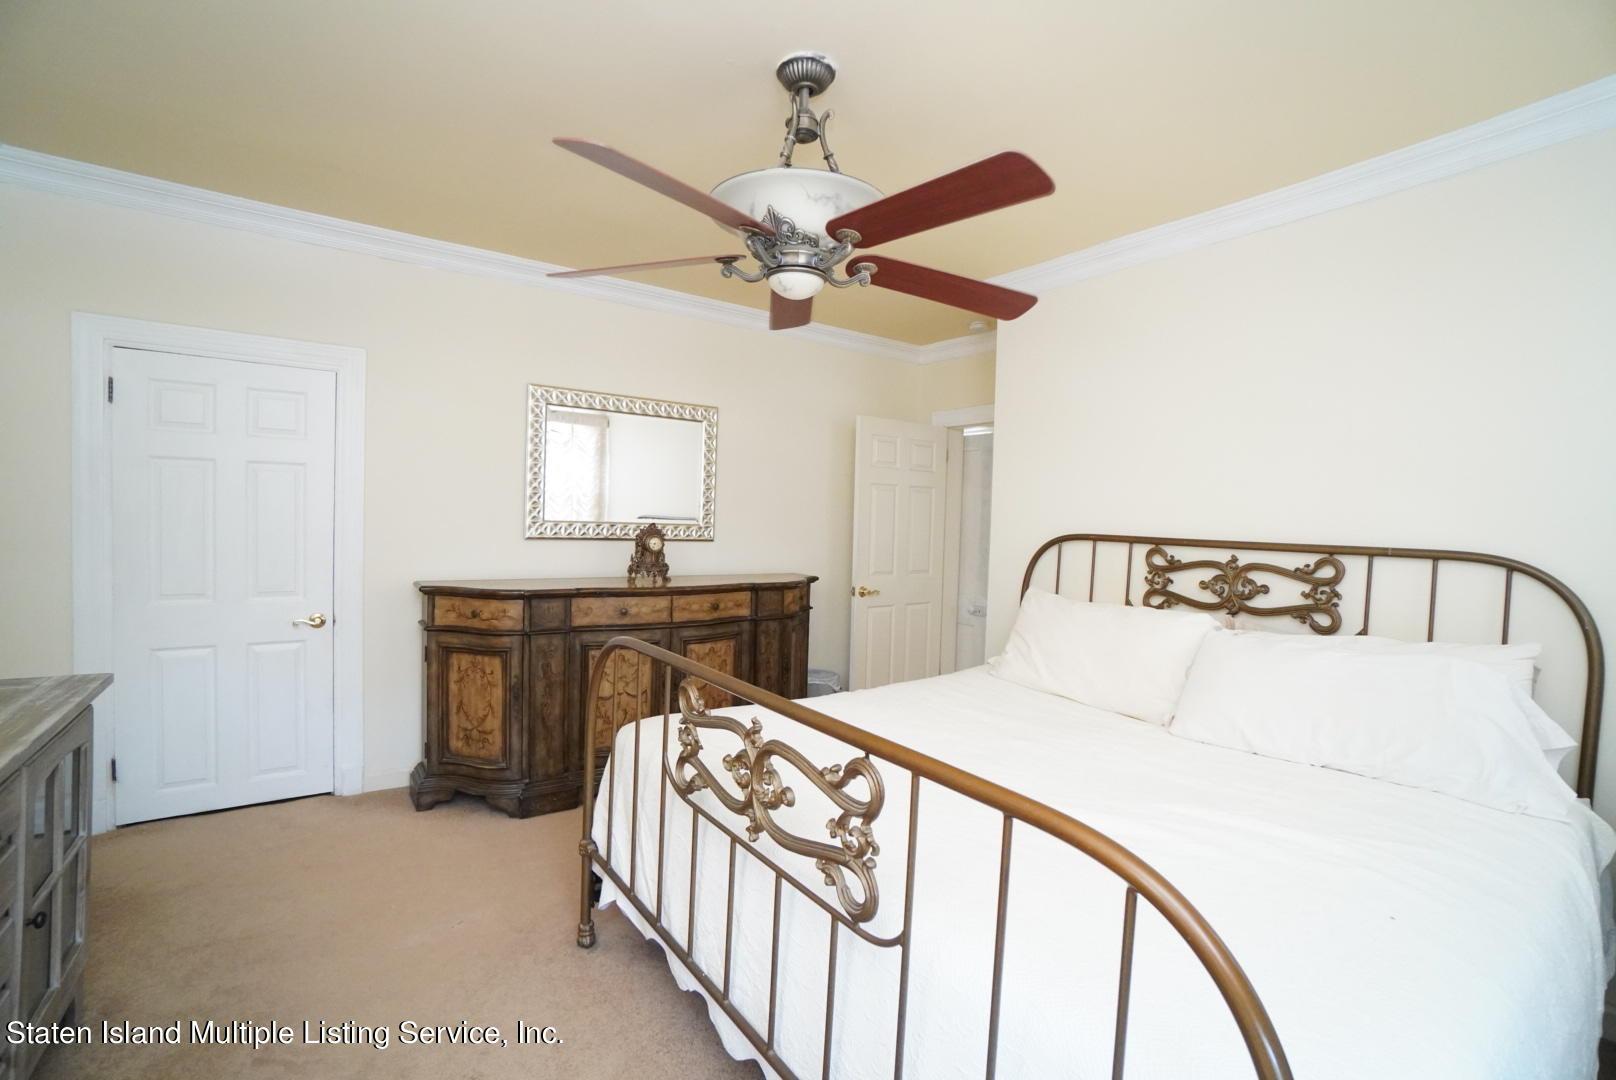 Single Family - Detached 264 Fisher Avenue  Staten Island, NY 10307, MLS-1146898-29